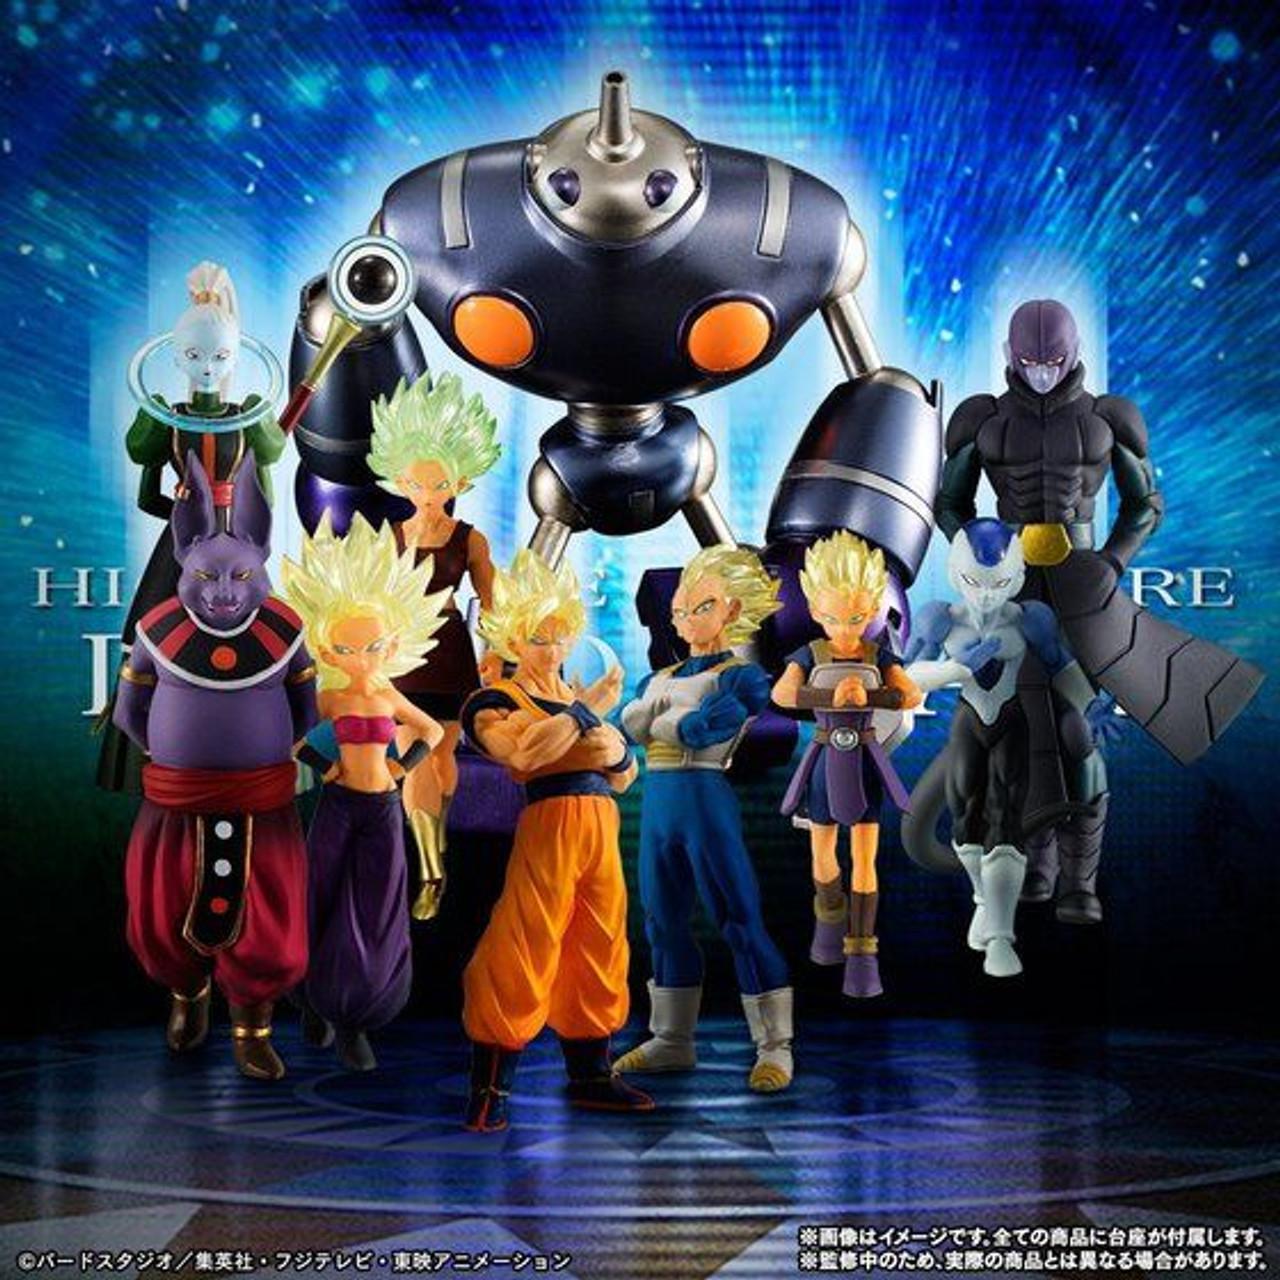 BANDAI DRAGON BALL Z Super HG Vol.8 All 5 type set Japan NEW Anime Manga